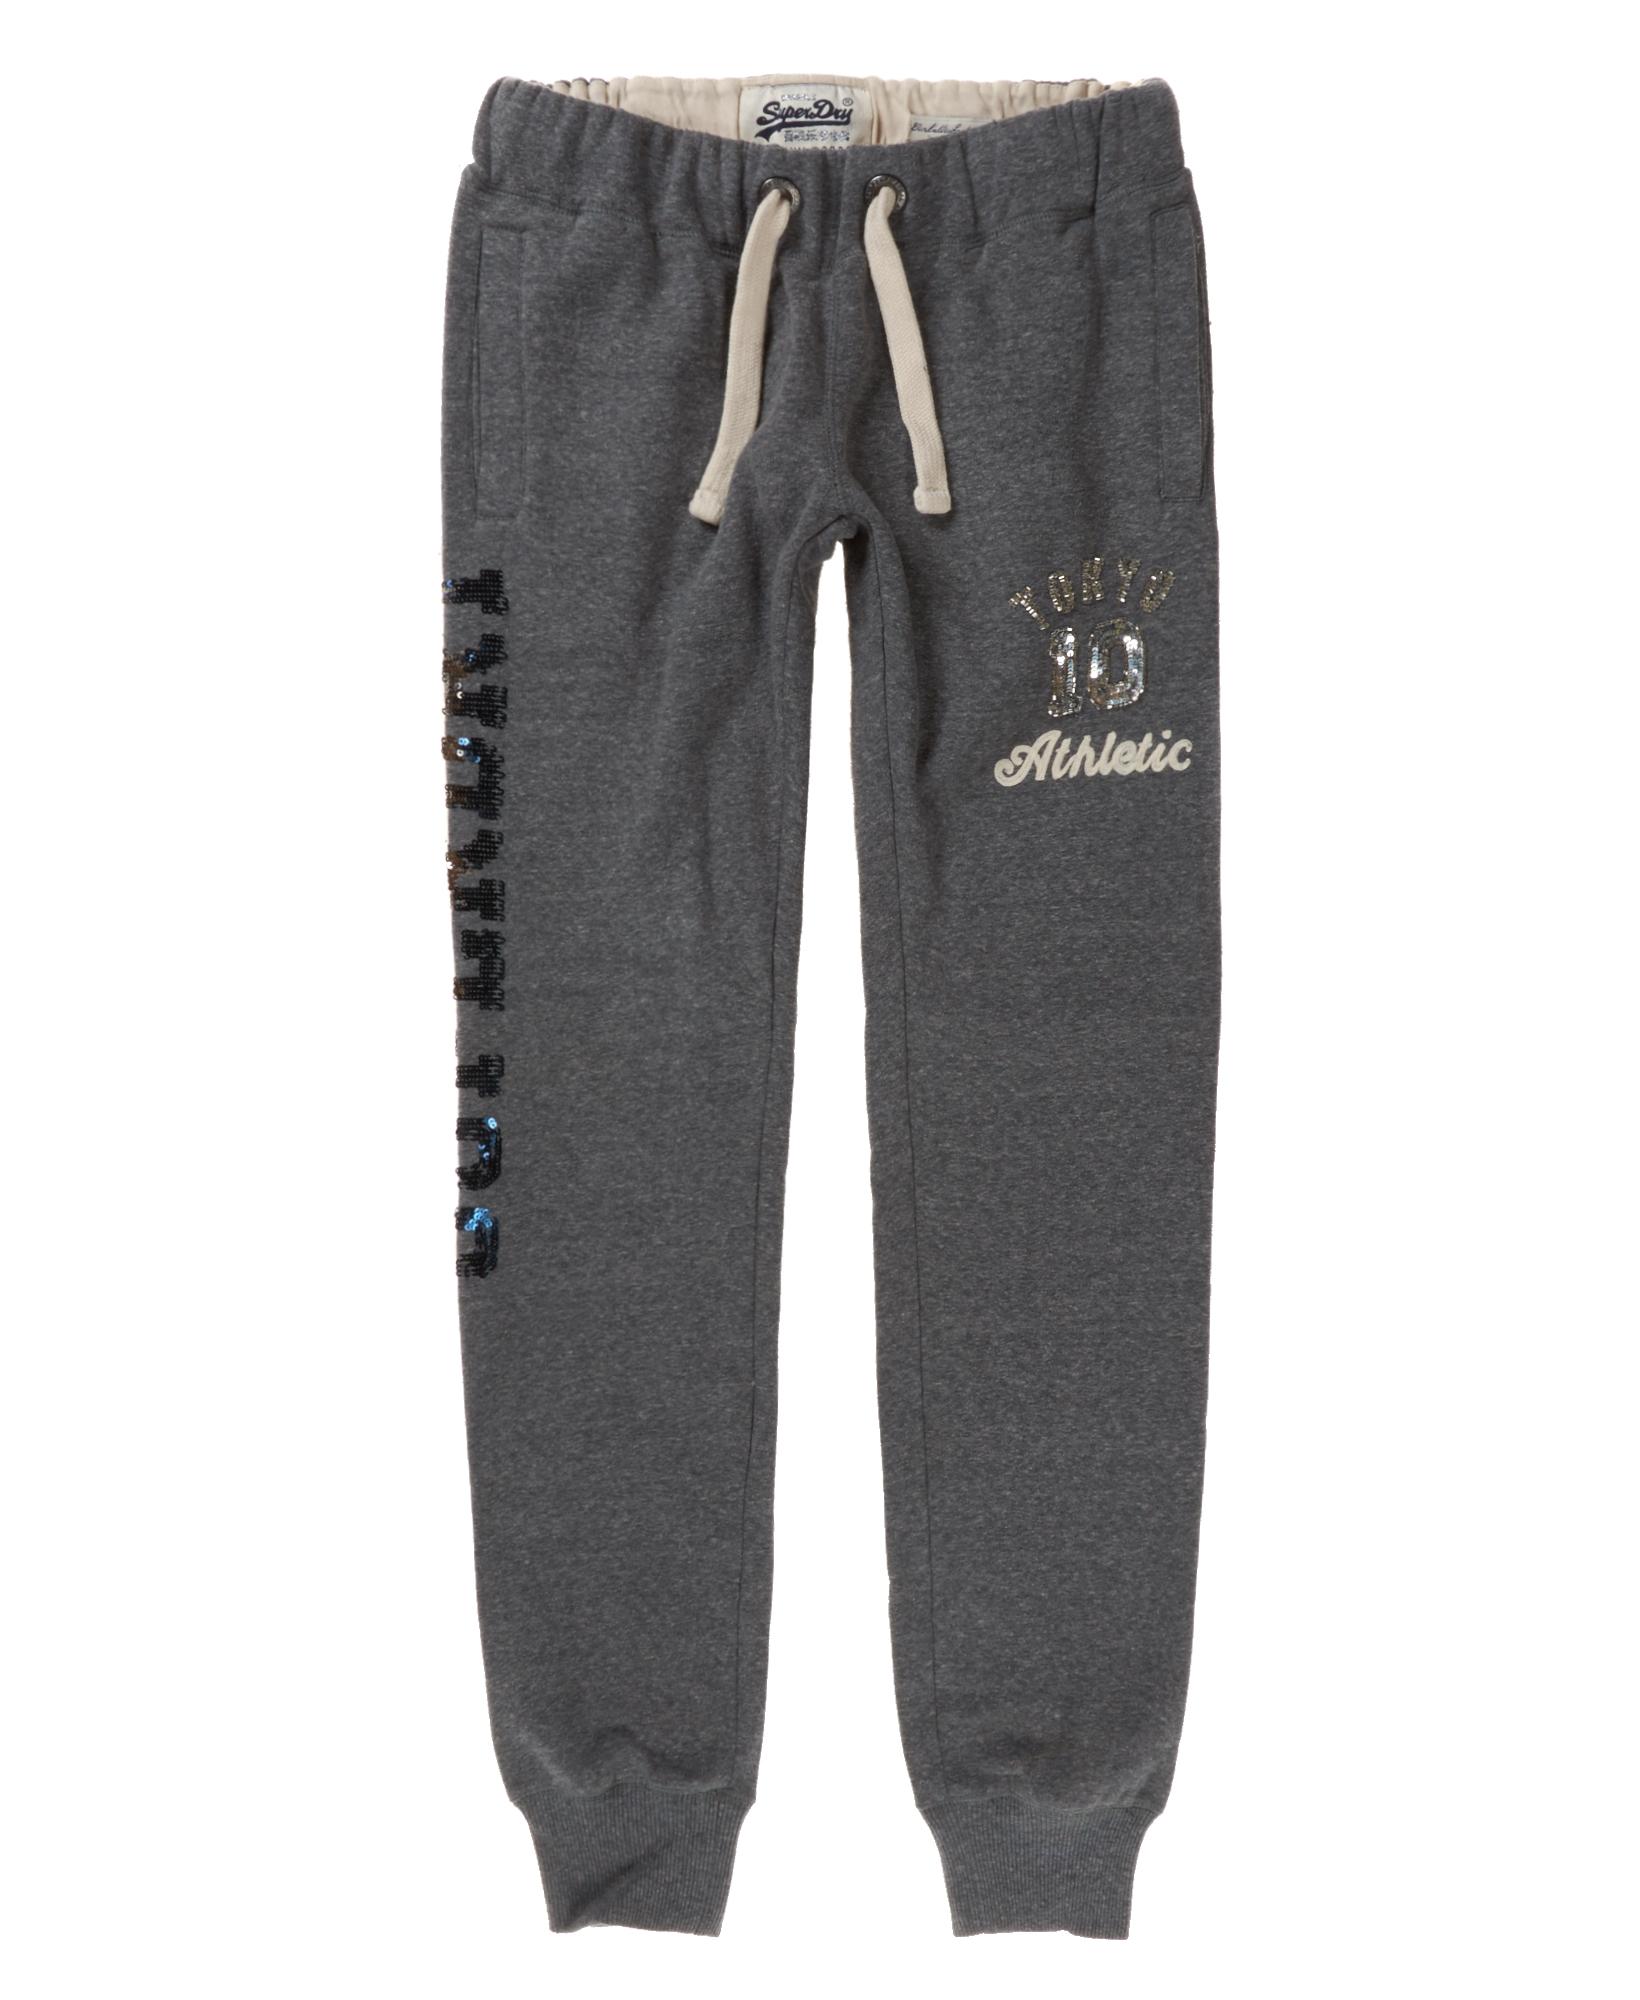 neue damen superdry ombre sparkle tokyo jogginghose dark meliert. Black Bedroom Furniture Sets. Home Design Ideas